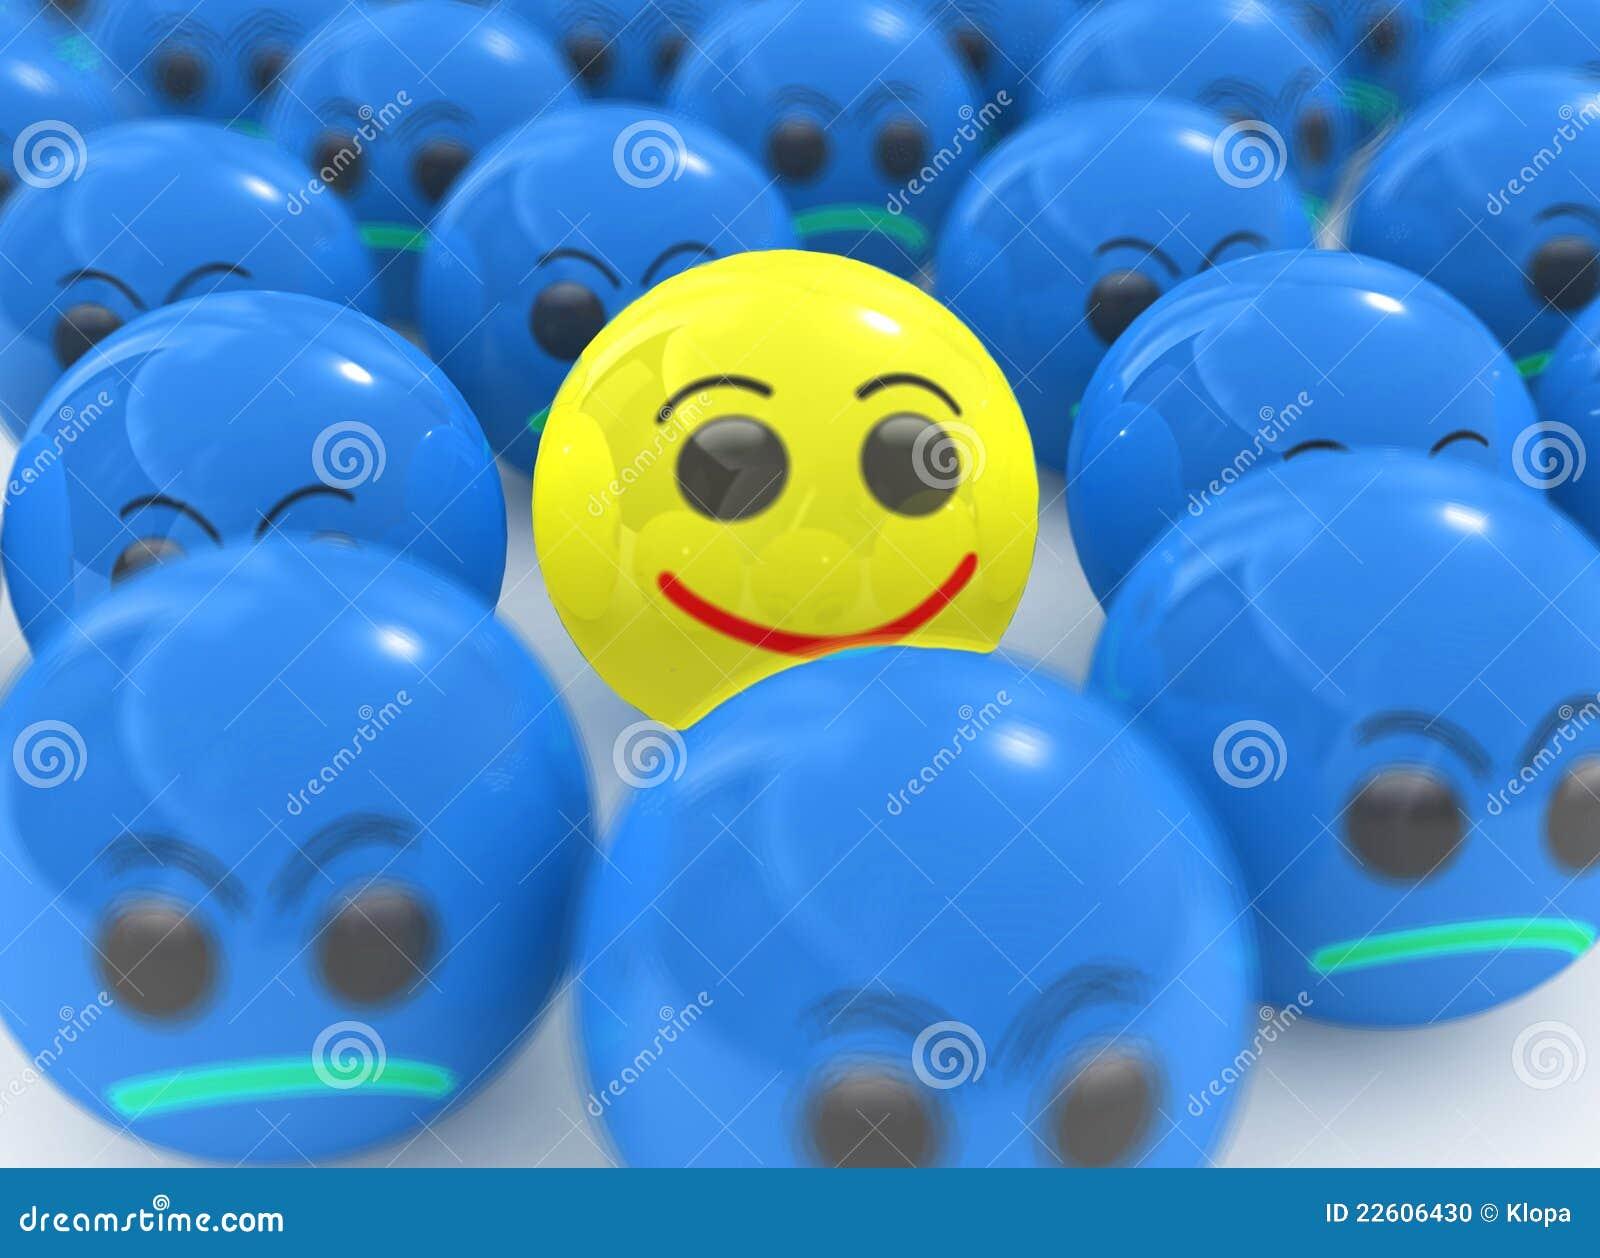 Individuele gele glimlach